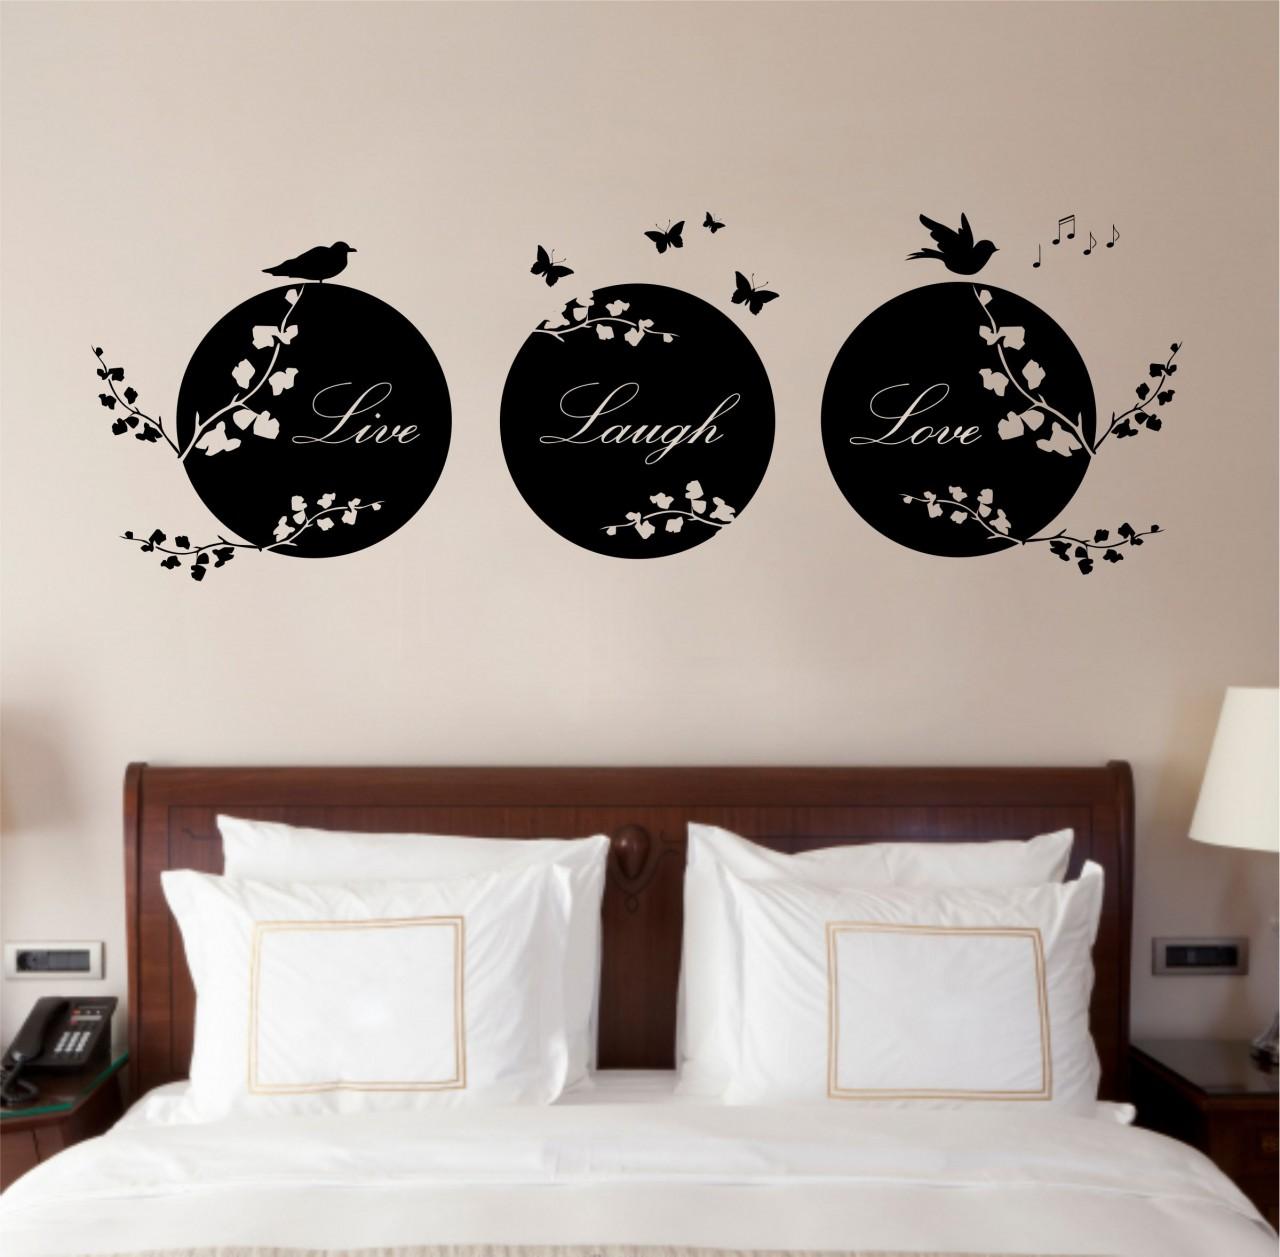 Bedroom Wall Art Stickers